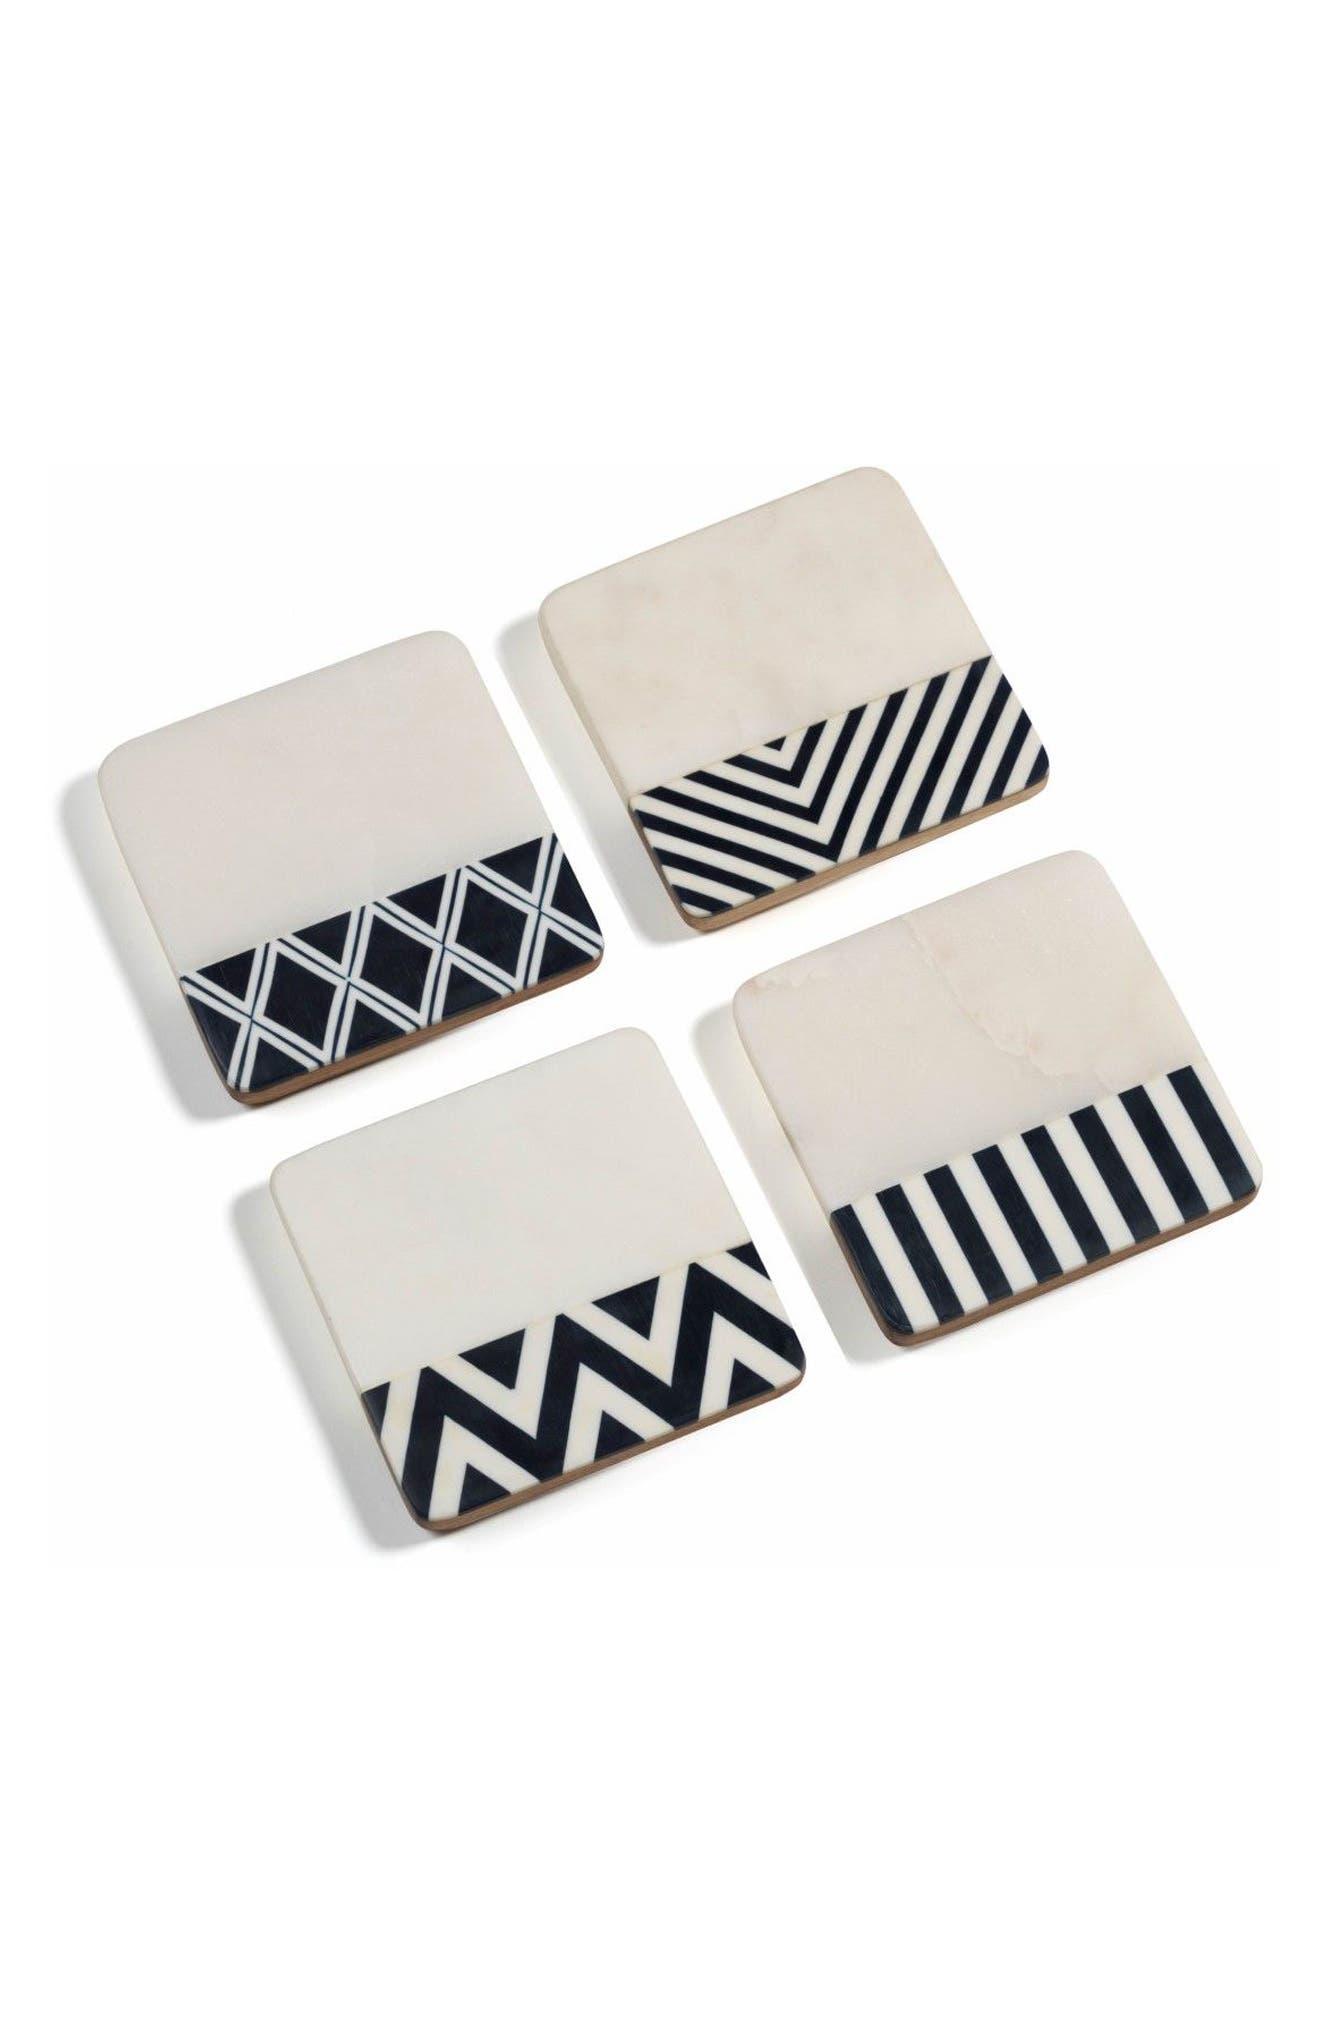 Marine Set of 4 Wood & Marble Coasters,                         Main,                         color, White/ Grey/ Black